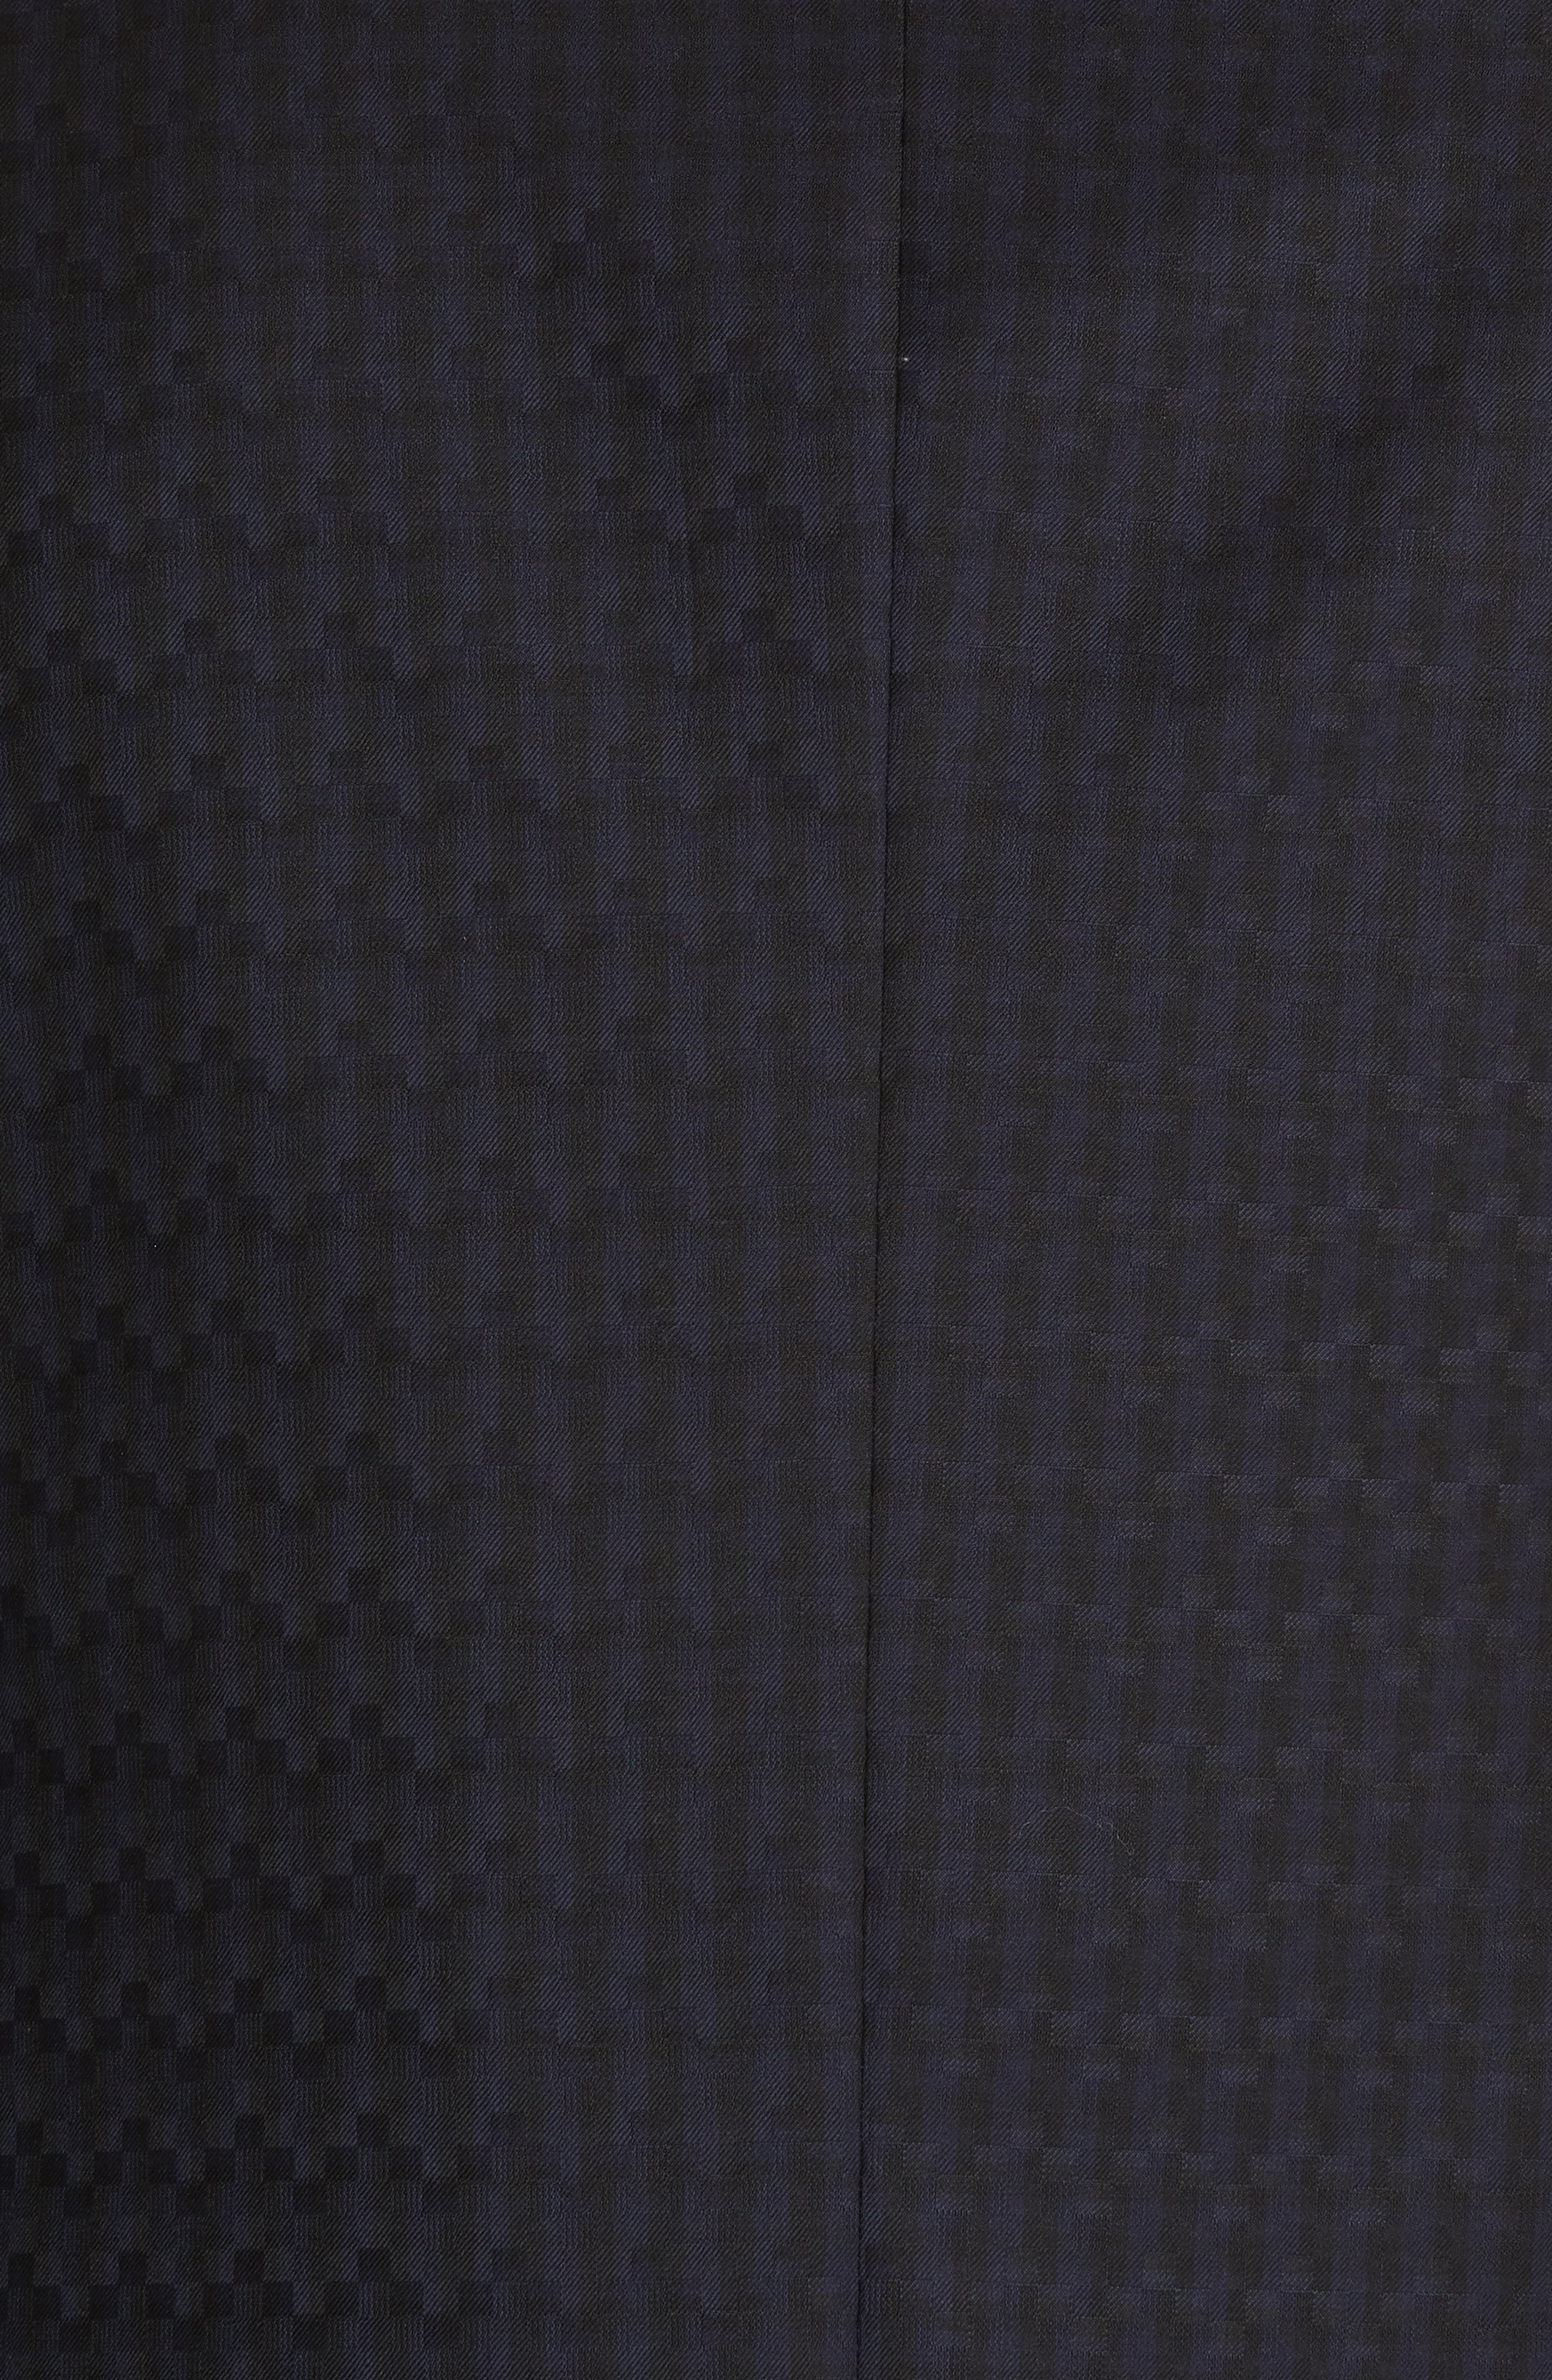 G-Line Trim Fit Wool Dinner Jacket,                             Alternate thumbnail 6, color,                             MIDNIGHT